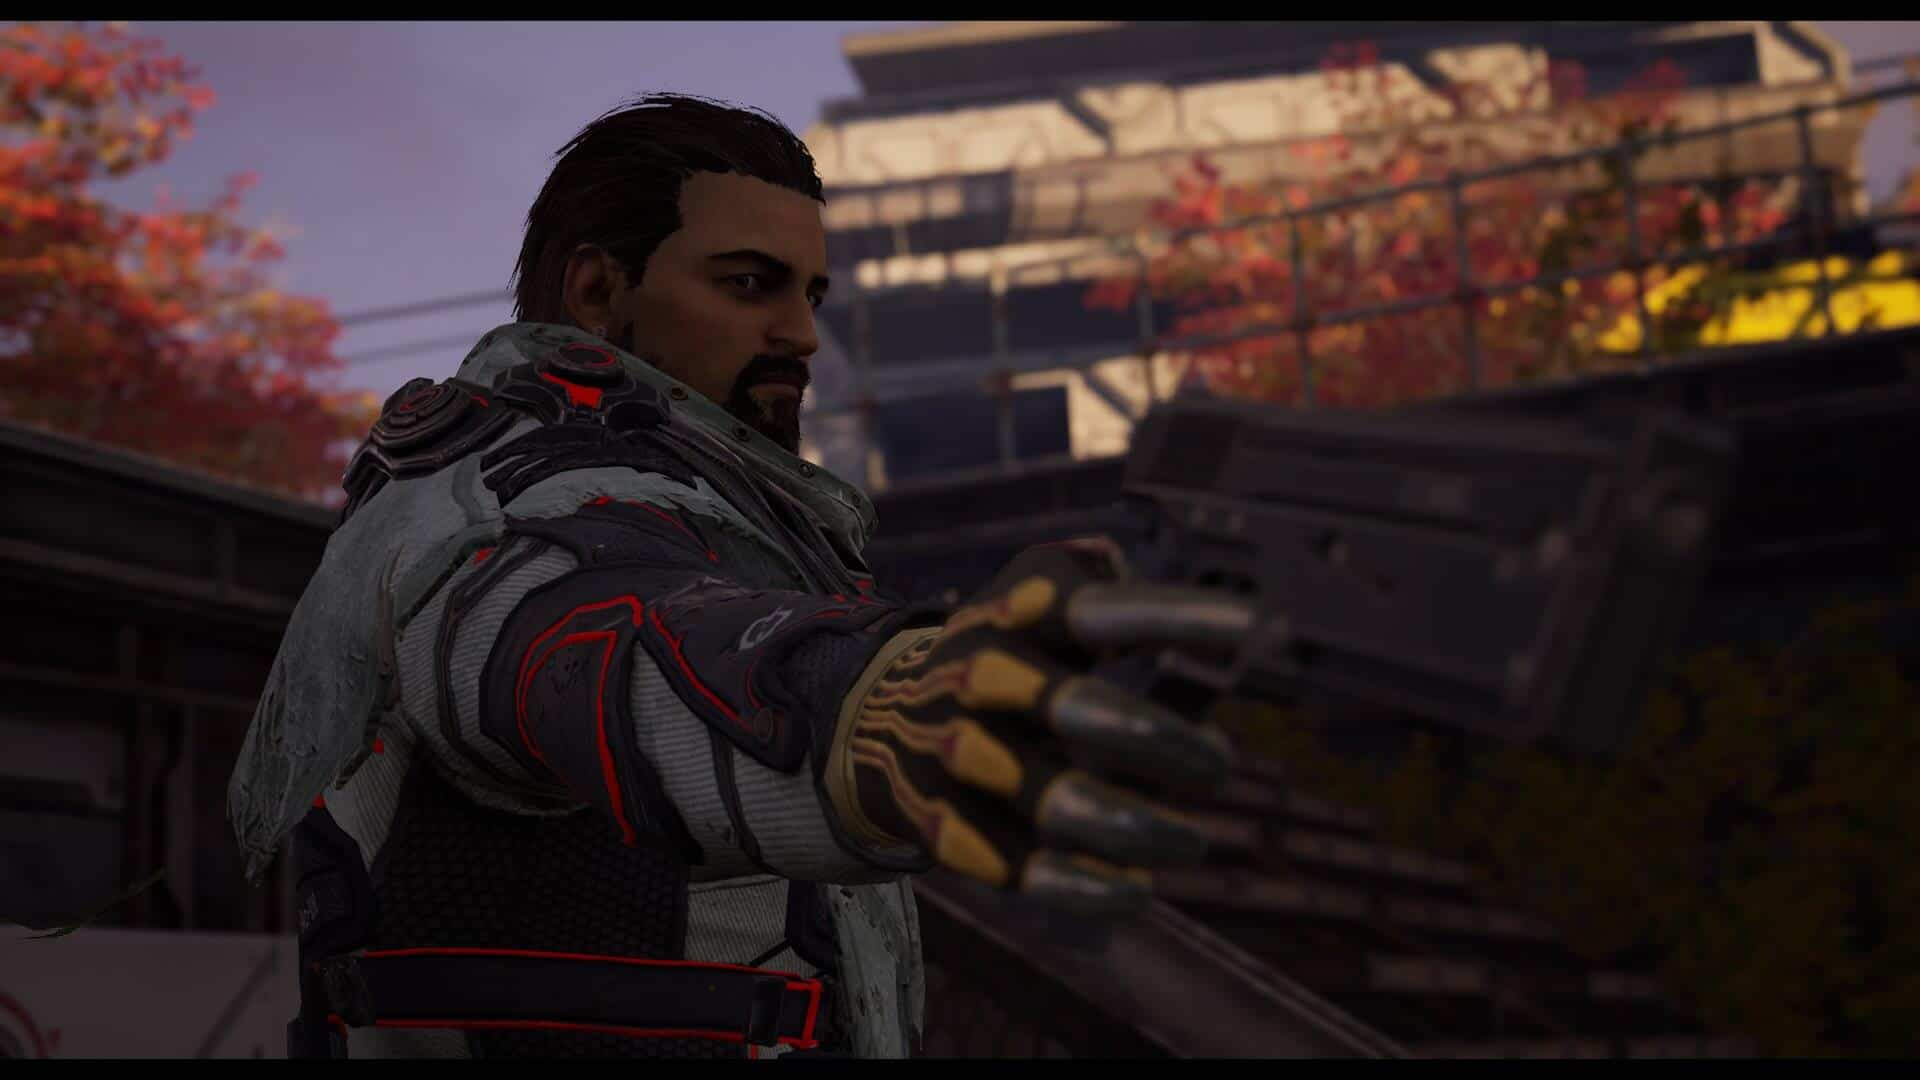 Leo Outriders Gun Fight